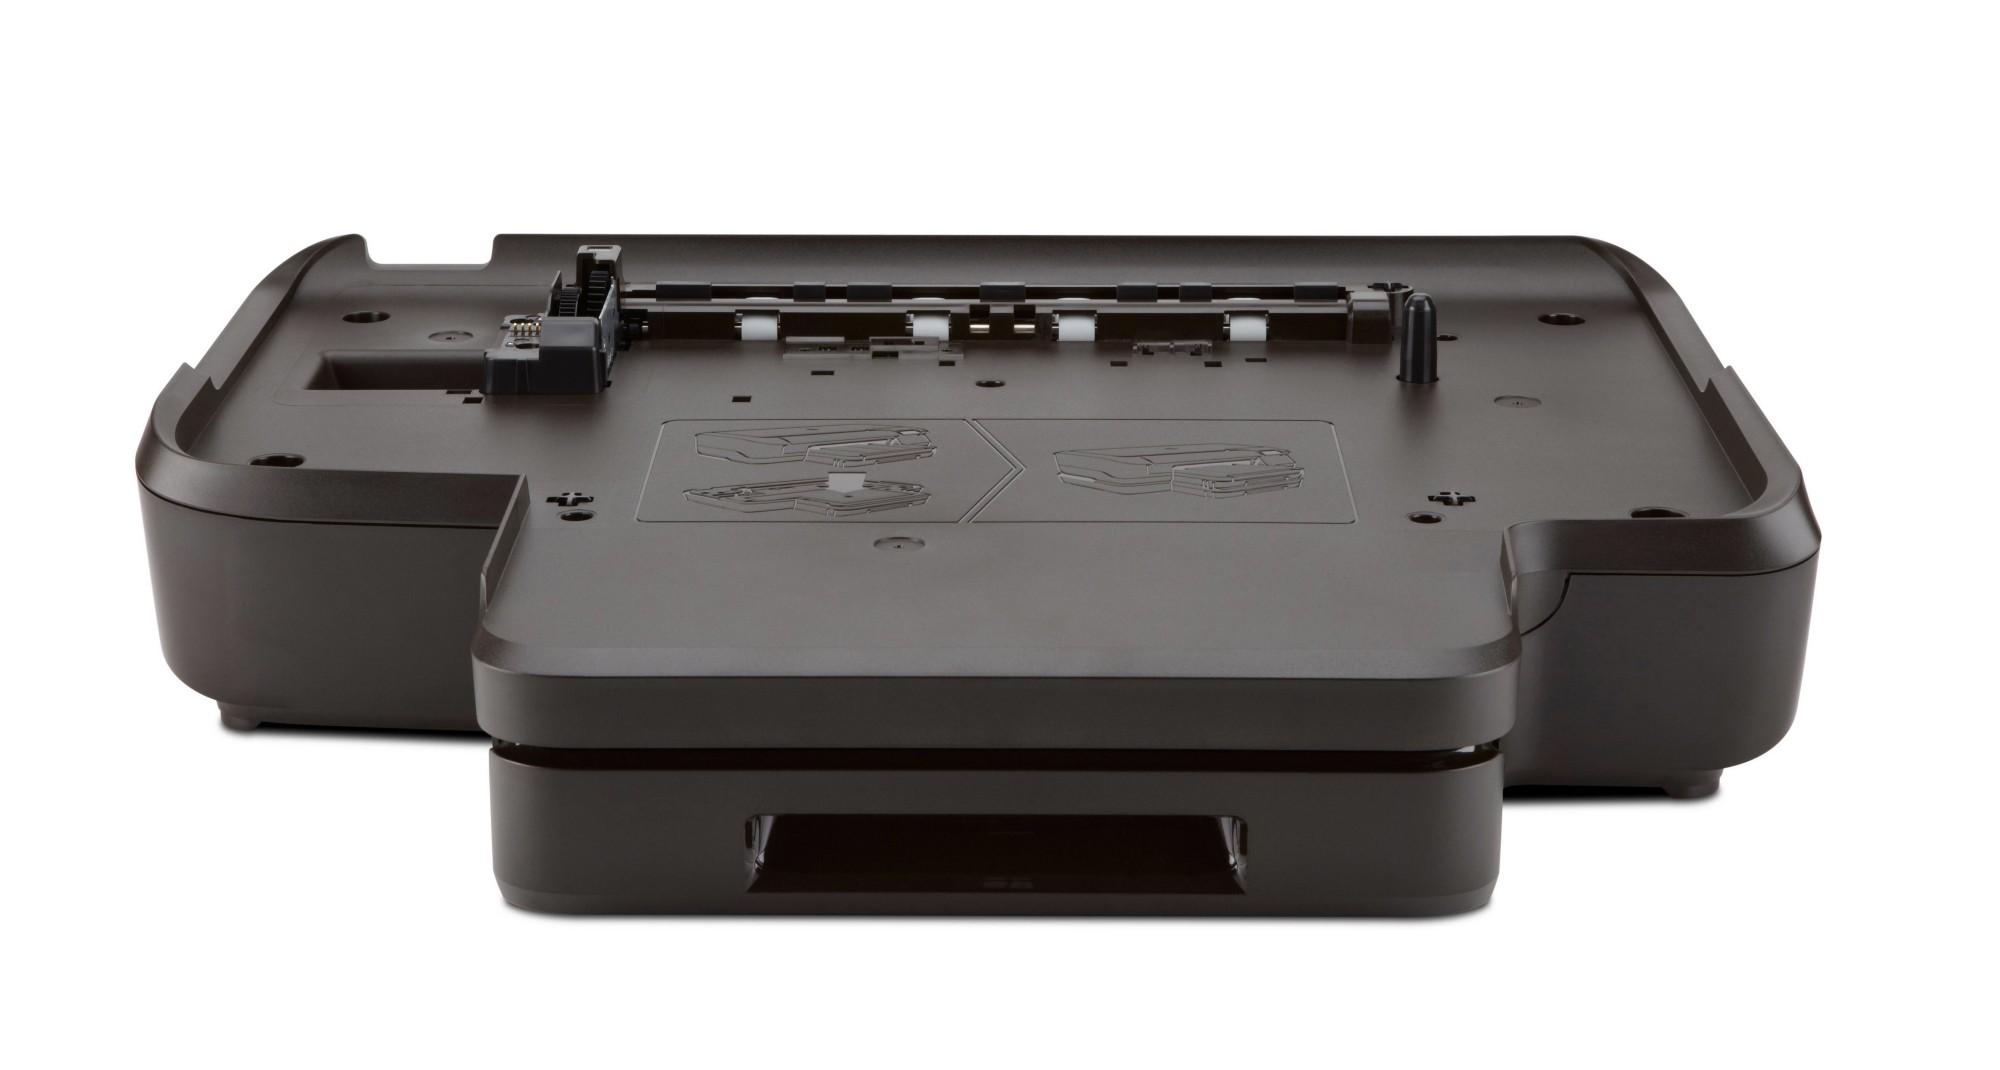 HP Officejet Pro 8100 ePrinter 250-sheet Paper Tray